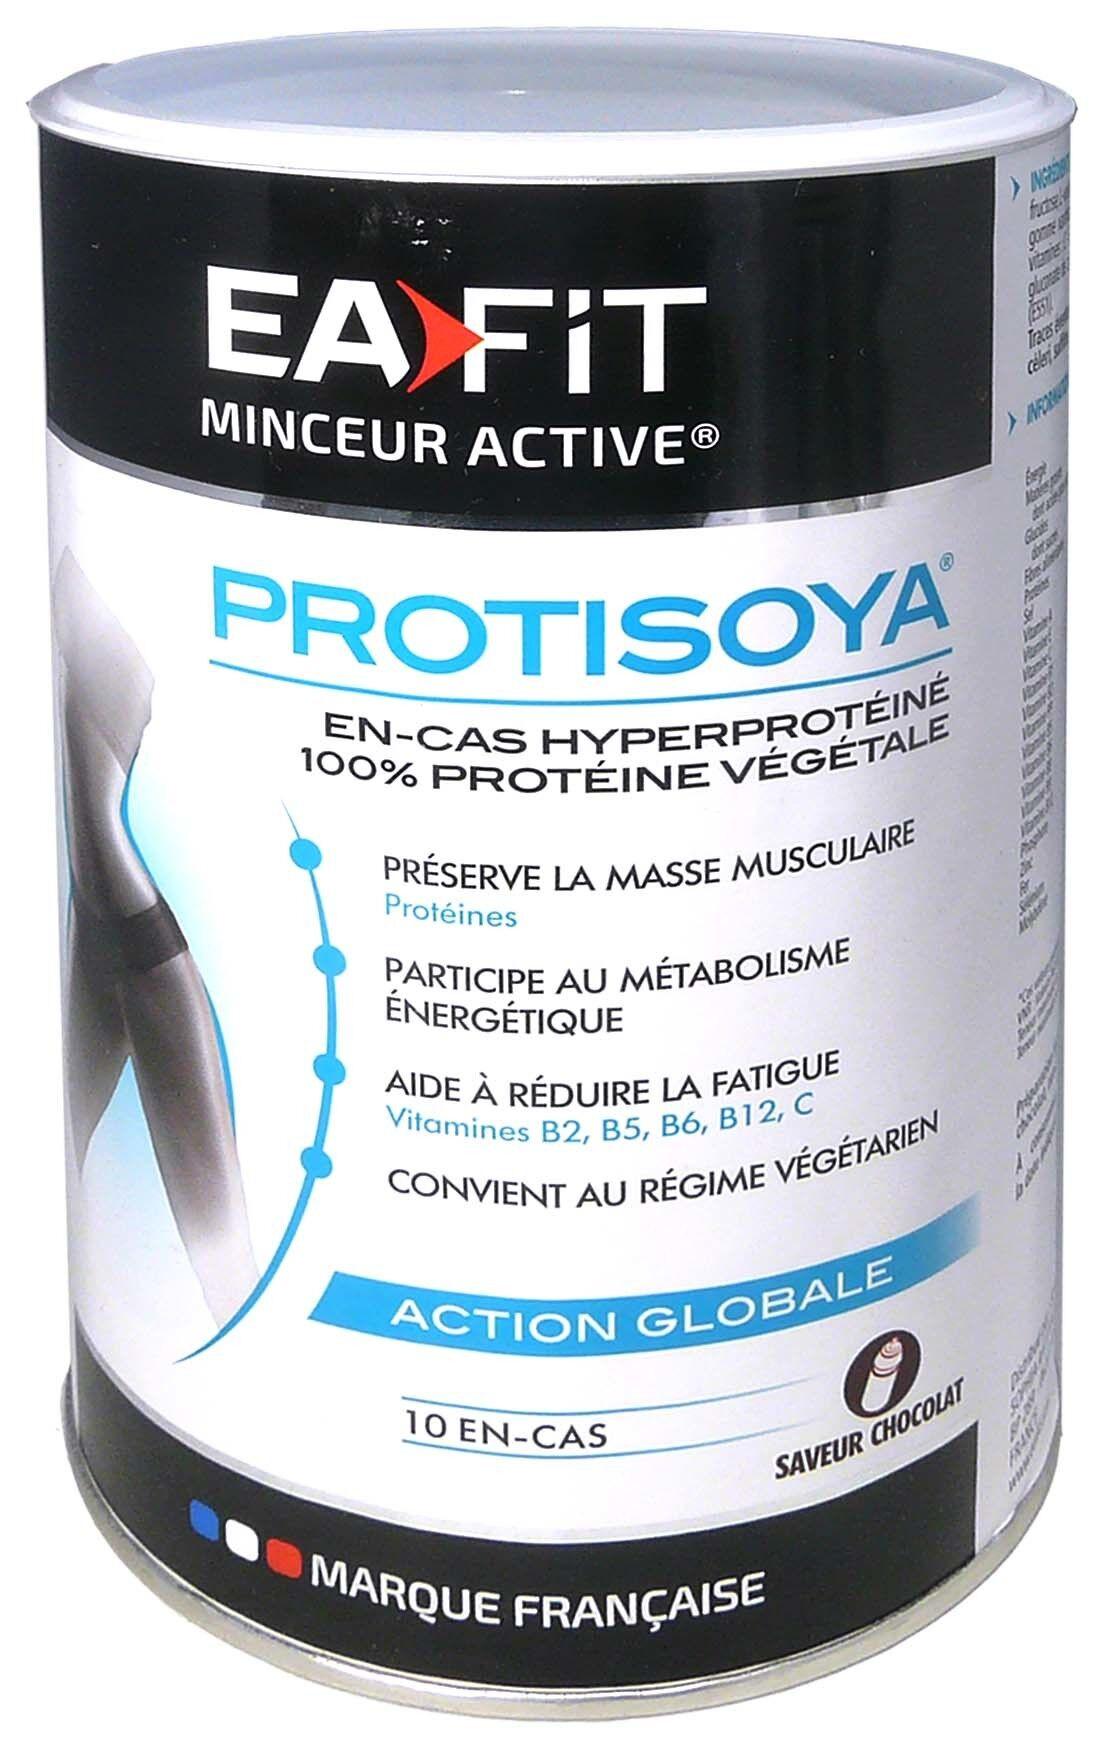 Eafit protisoya action globale gout chocolat 320g